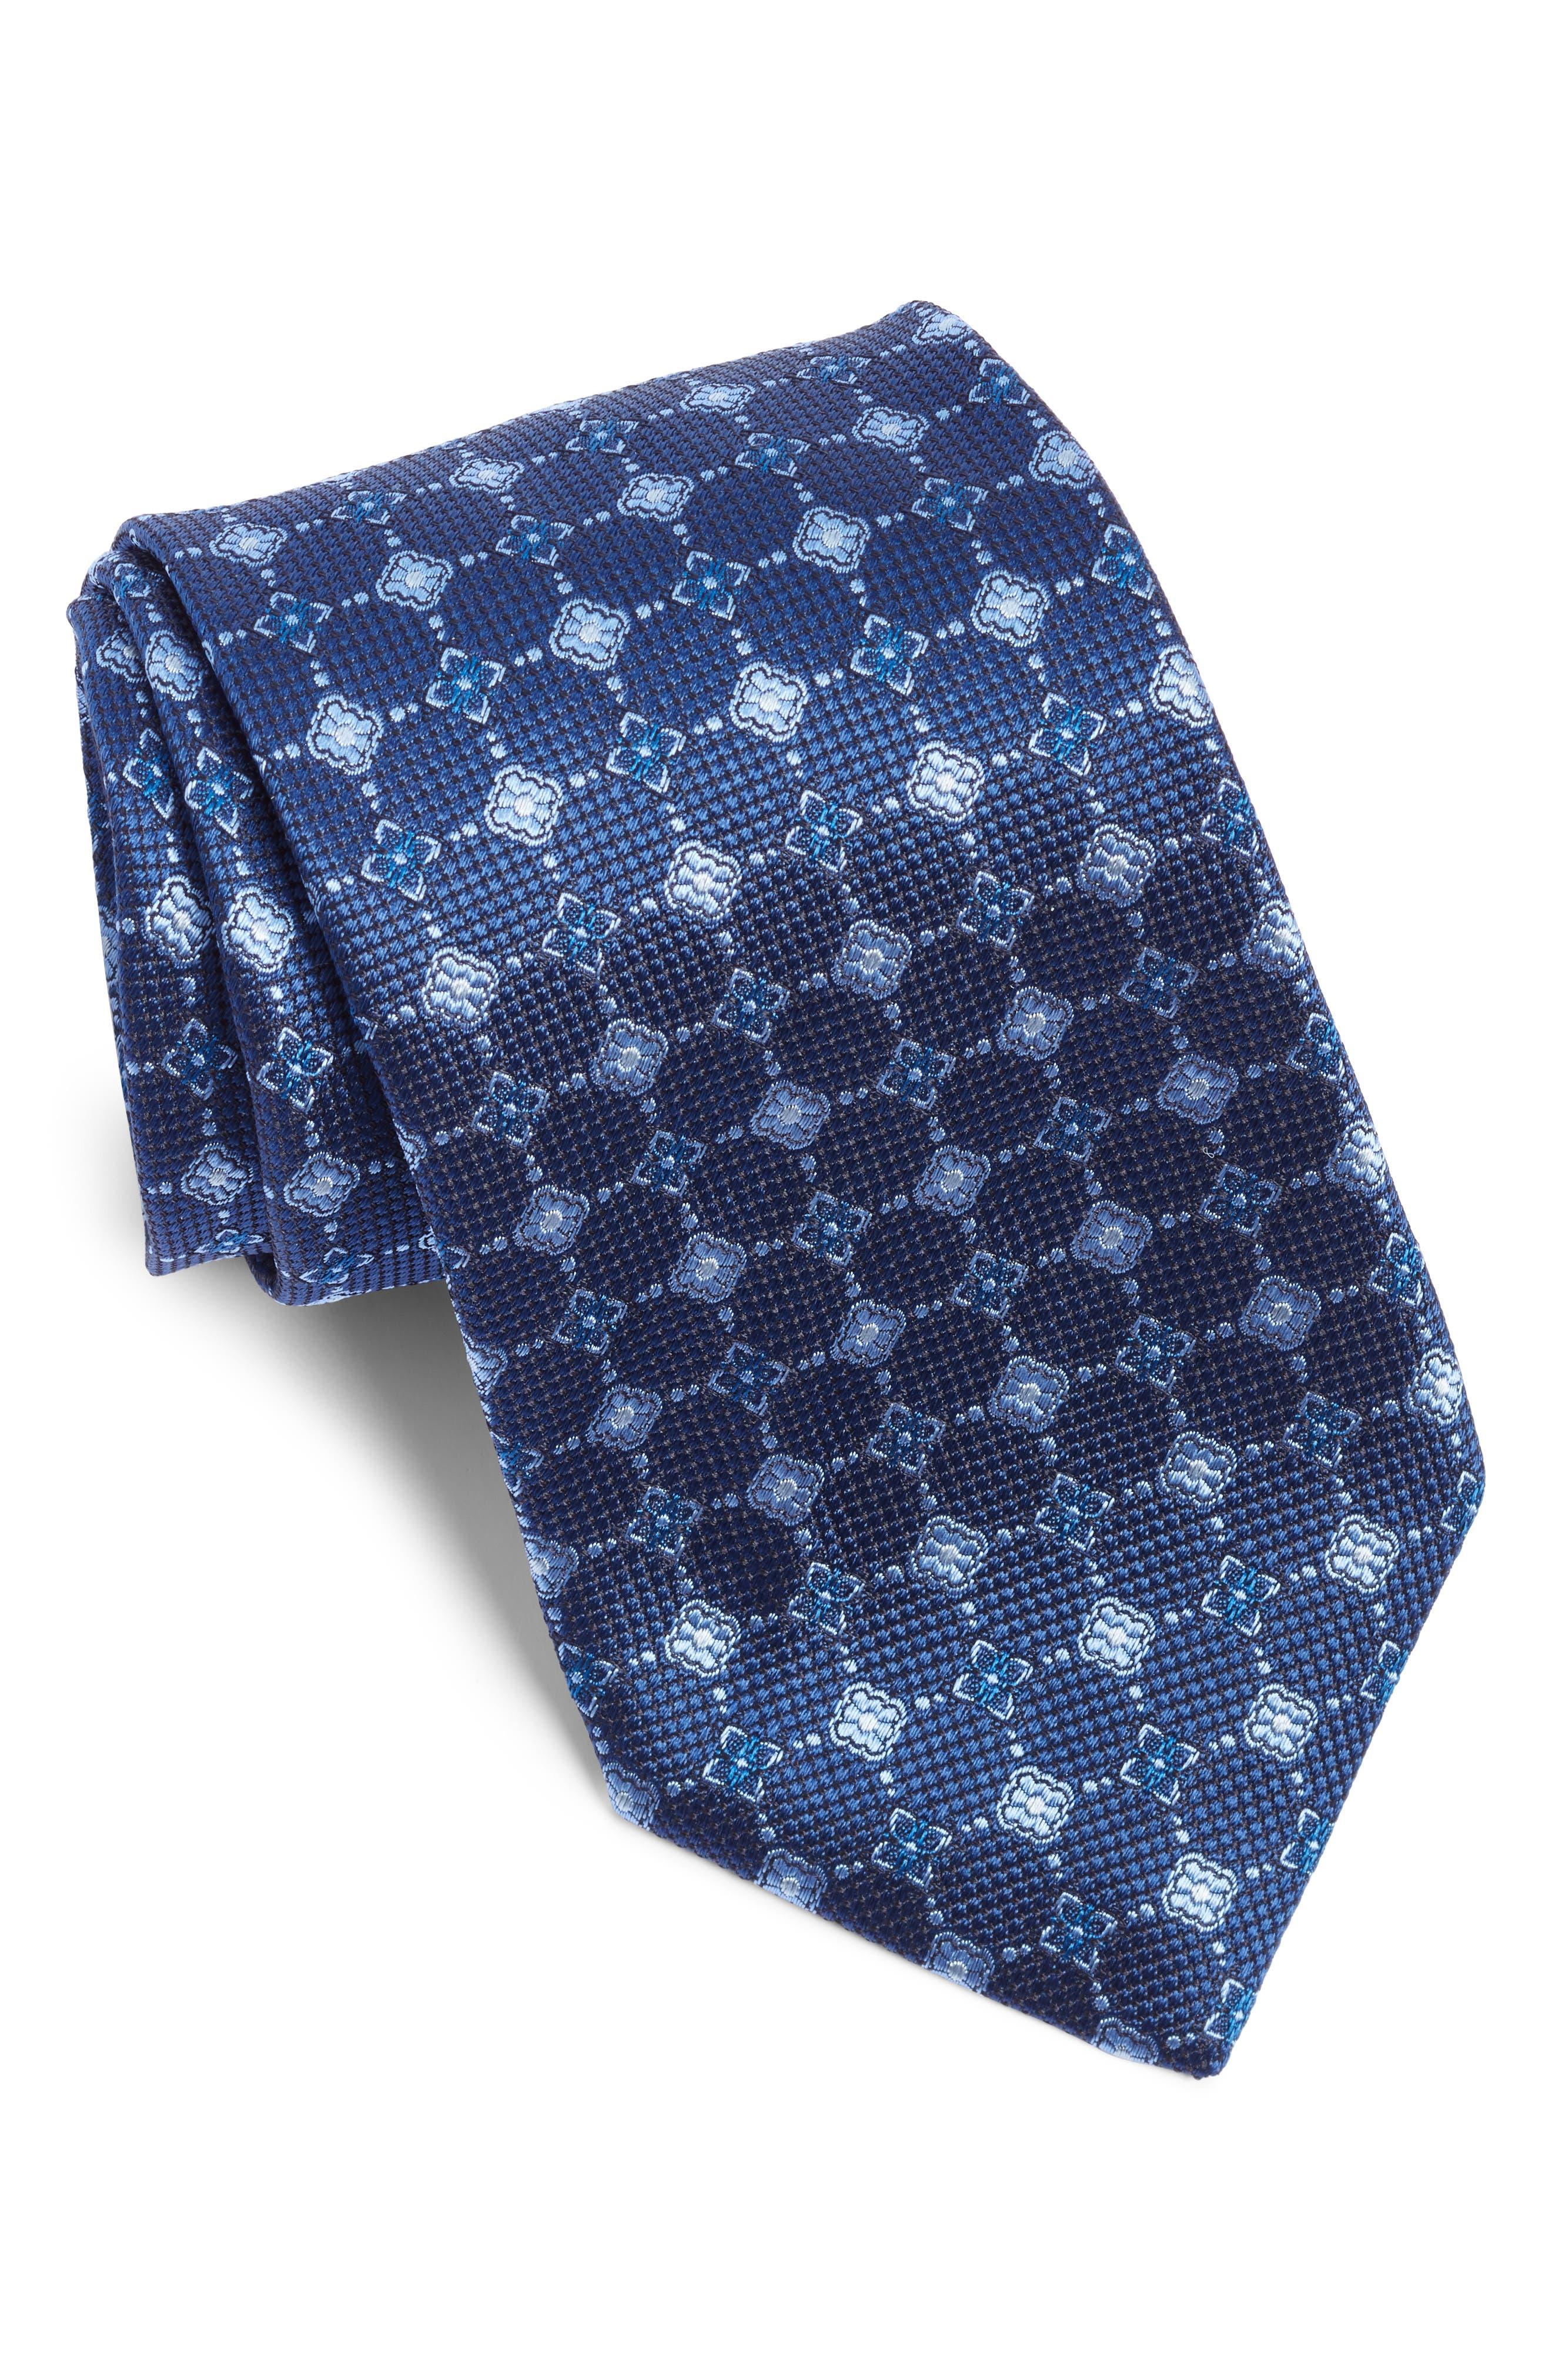 Medallion Silk Tie,                             Main thumbnail 1, color,                             BLUE